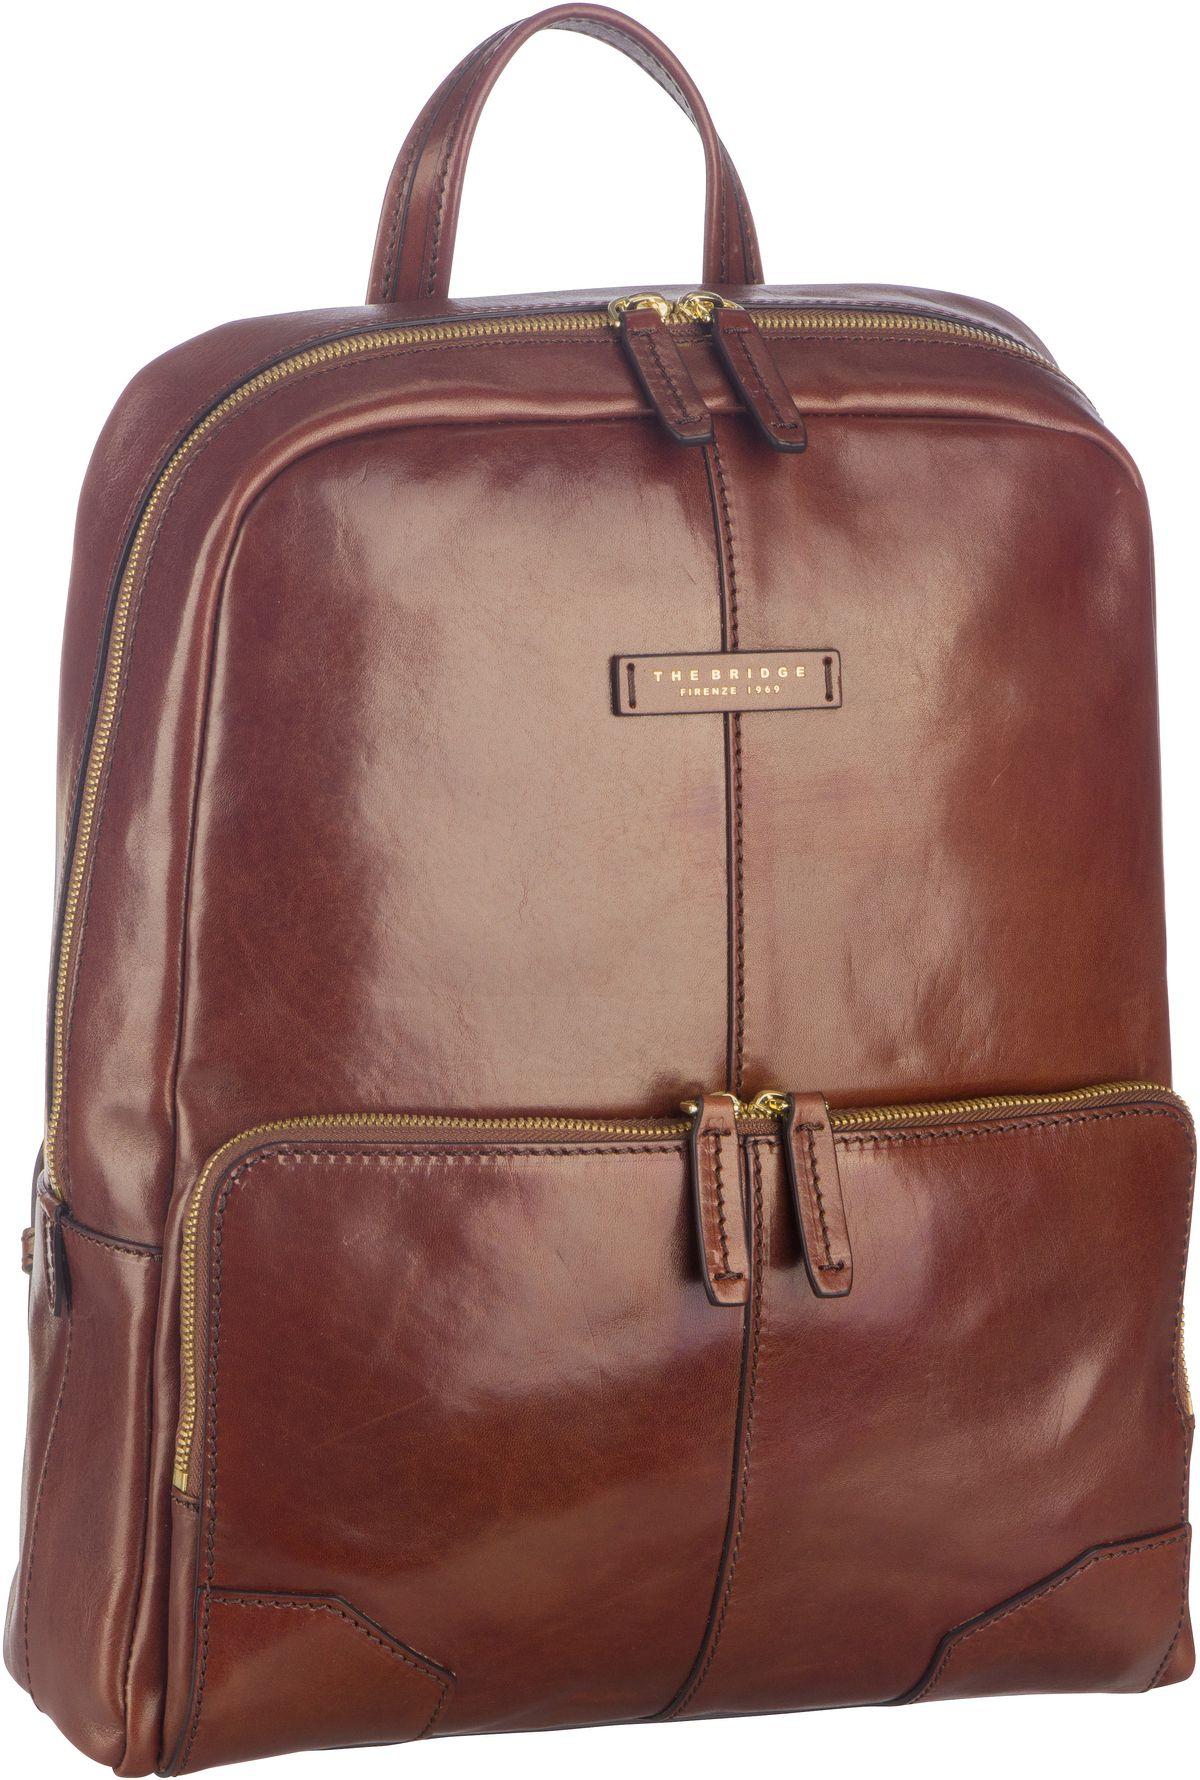 Rucksack / Daypack Vespucci 3640 Marrone